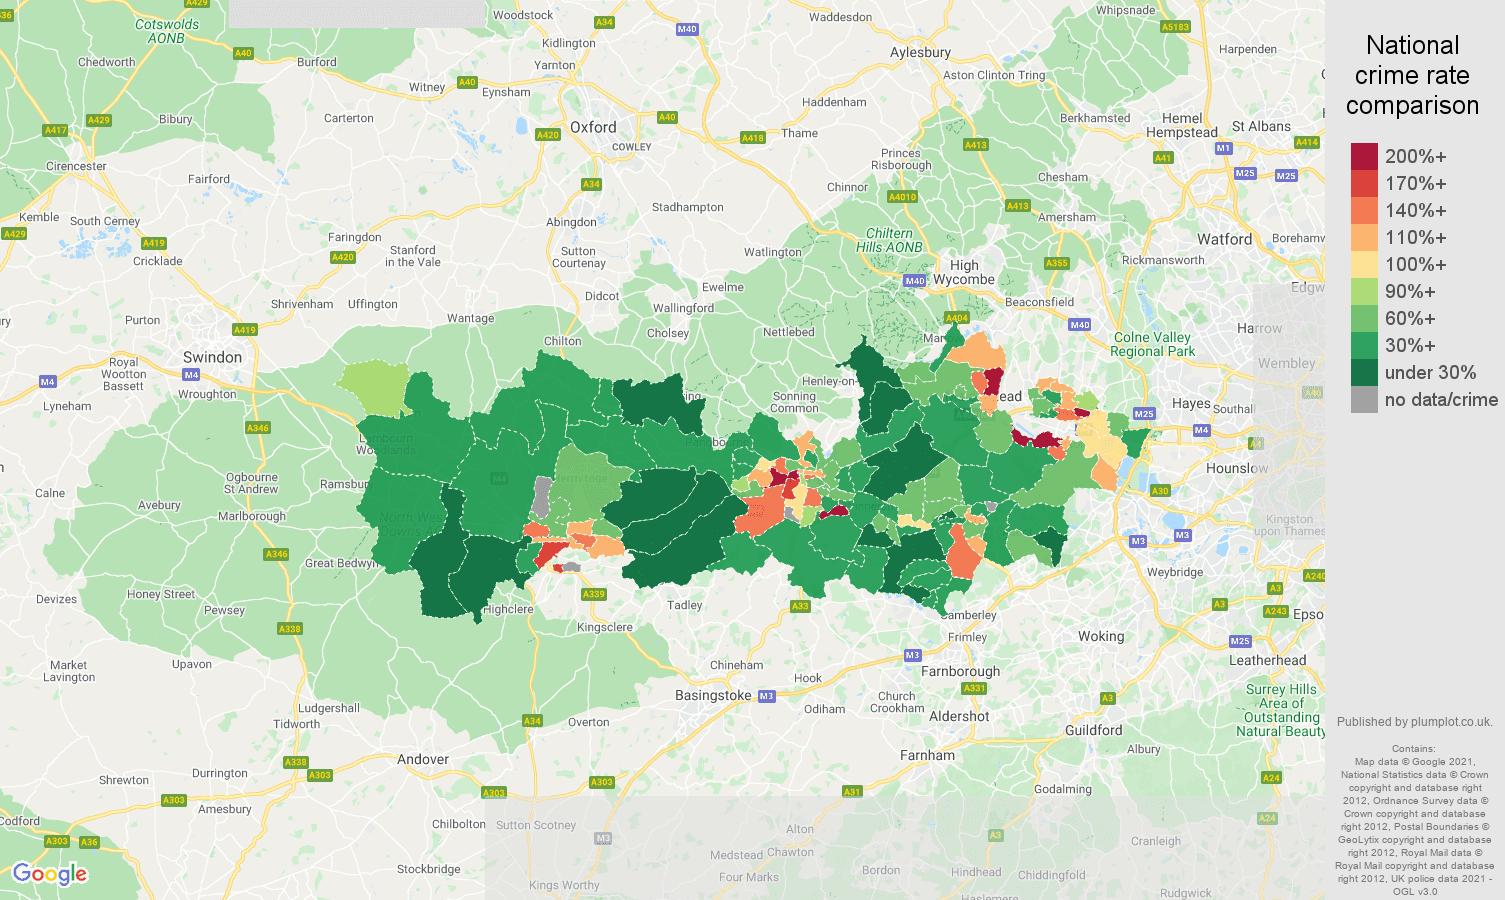 Berkshire drugs crime rate comparison map